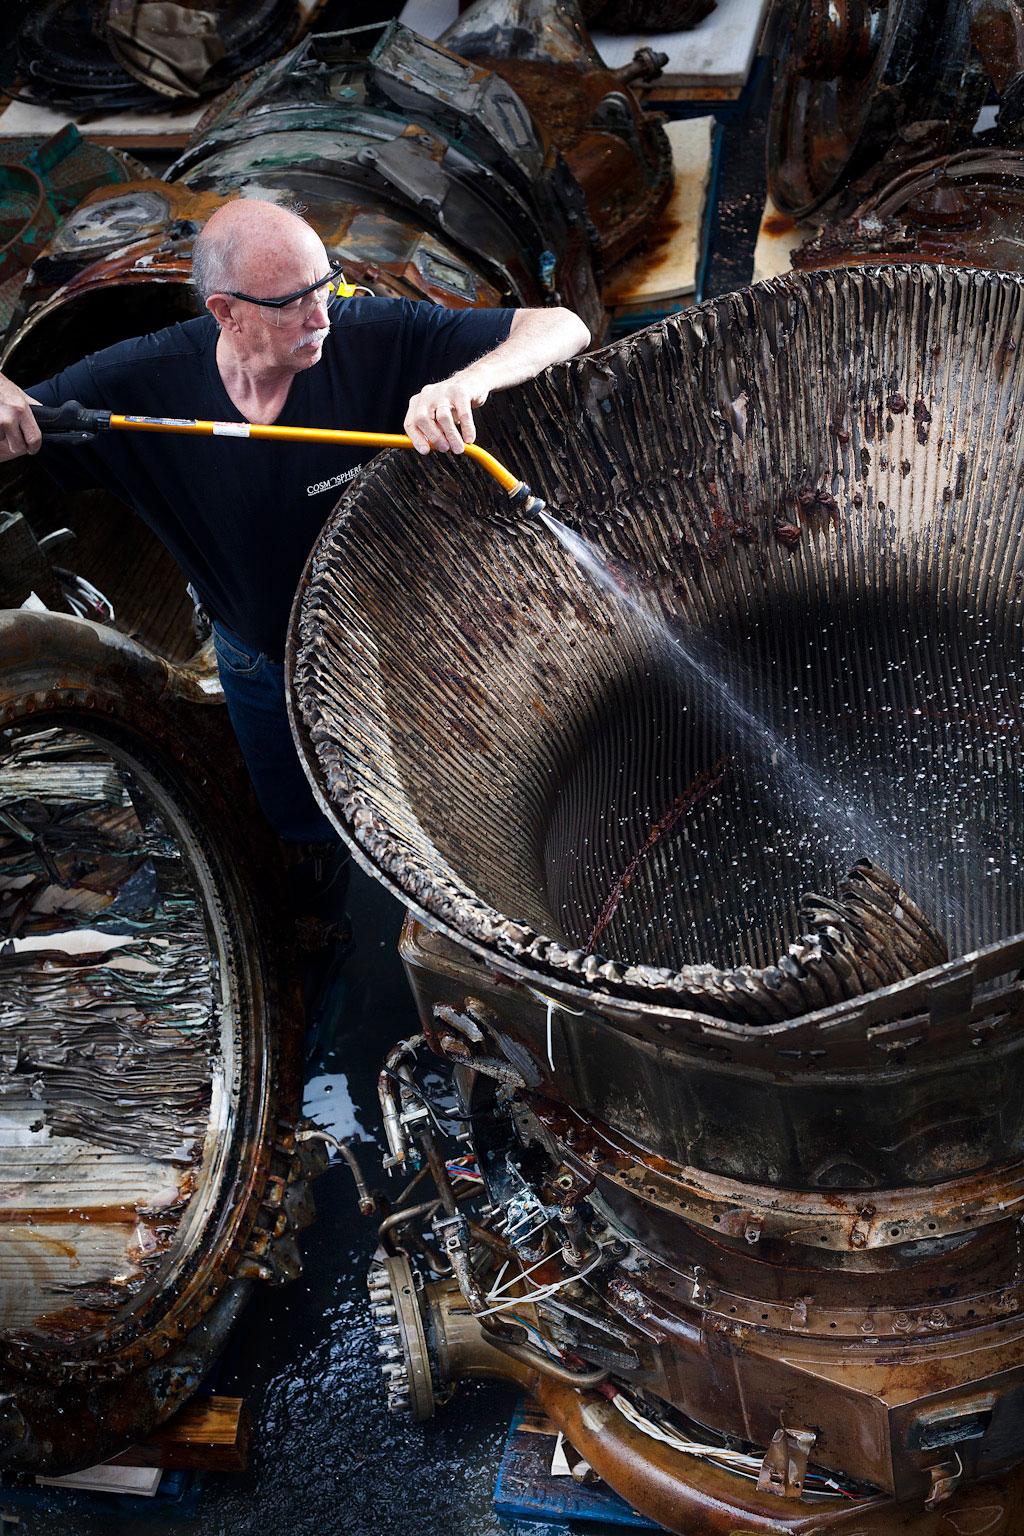 apollo spacecraft engine - photo #22